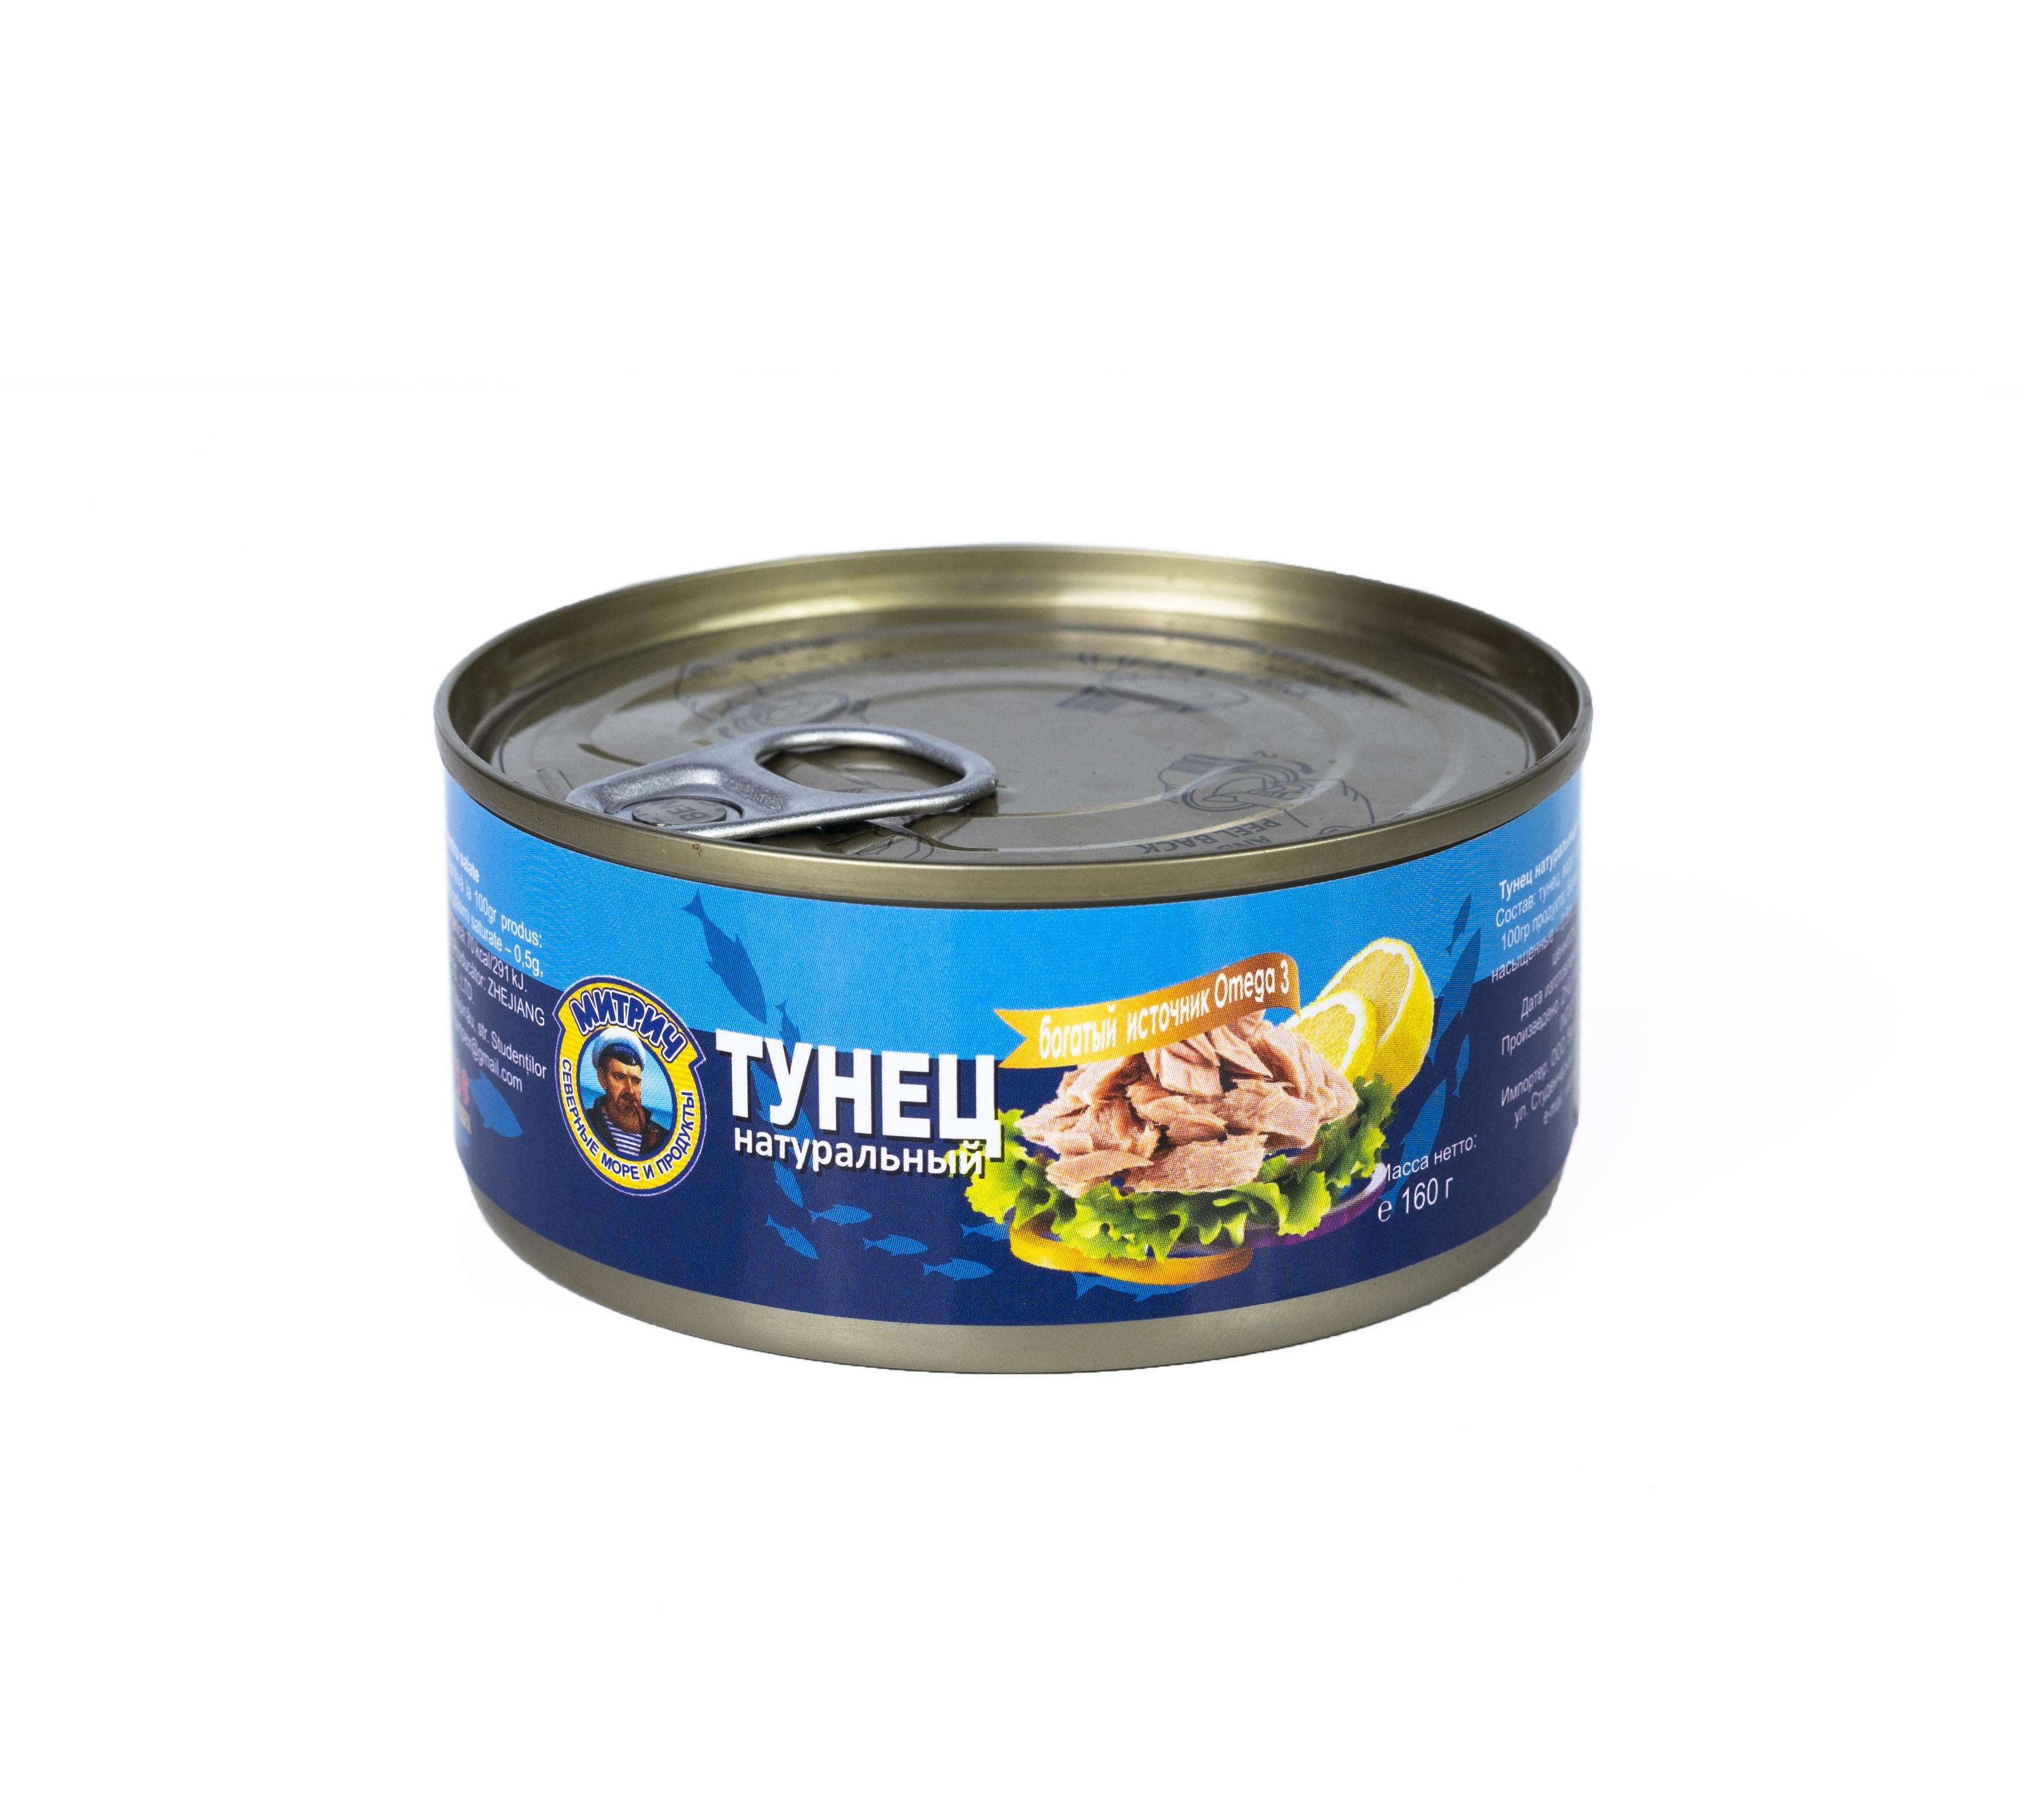 Ton p/u salate natur Mitrici 160gr